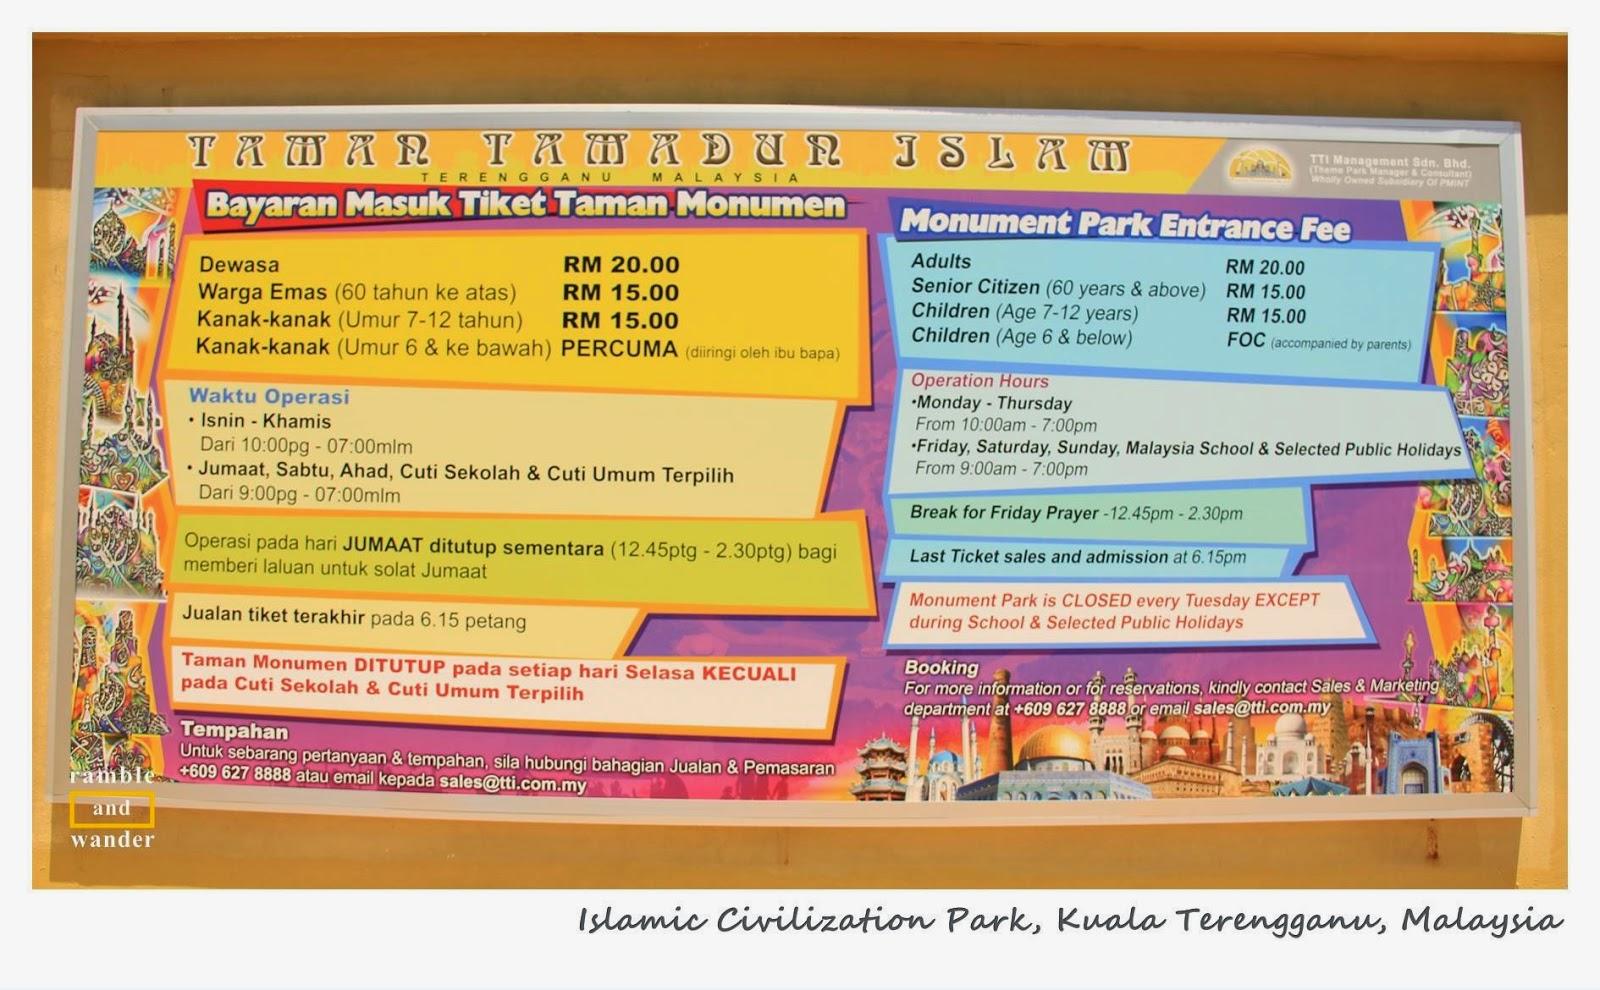 Malaysia Islamic Civilization Park In Kuala Terengganu Ramble And Et Ticket Sunway Lagoon Dewasa Lumpur Taman Tamadun Islam